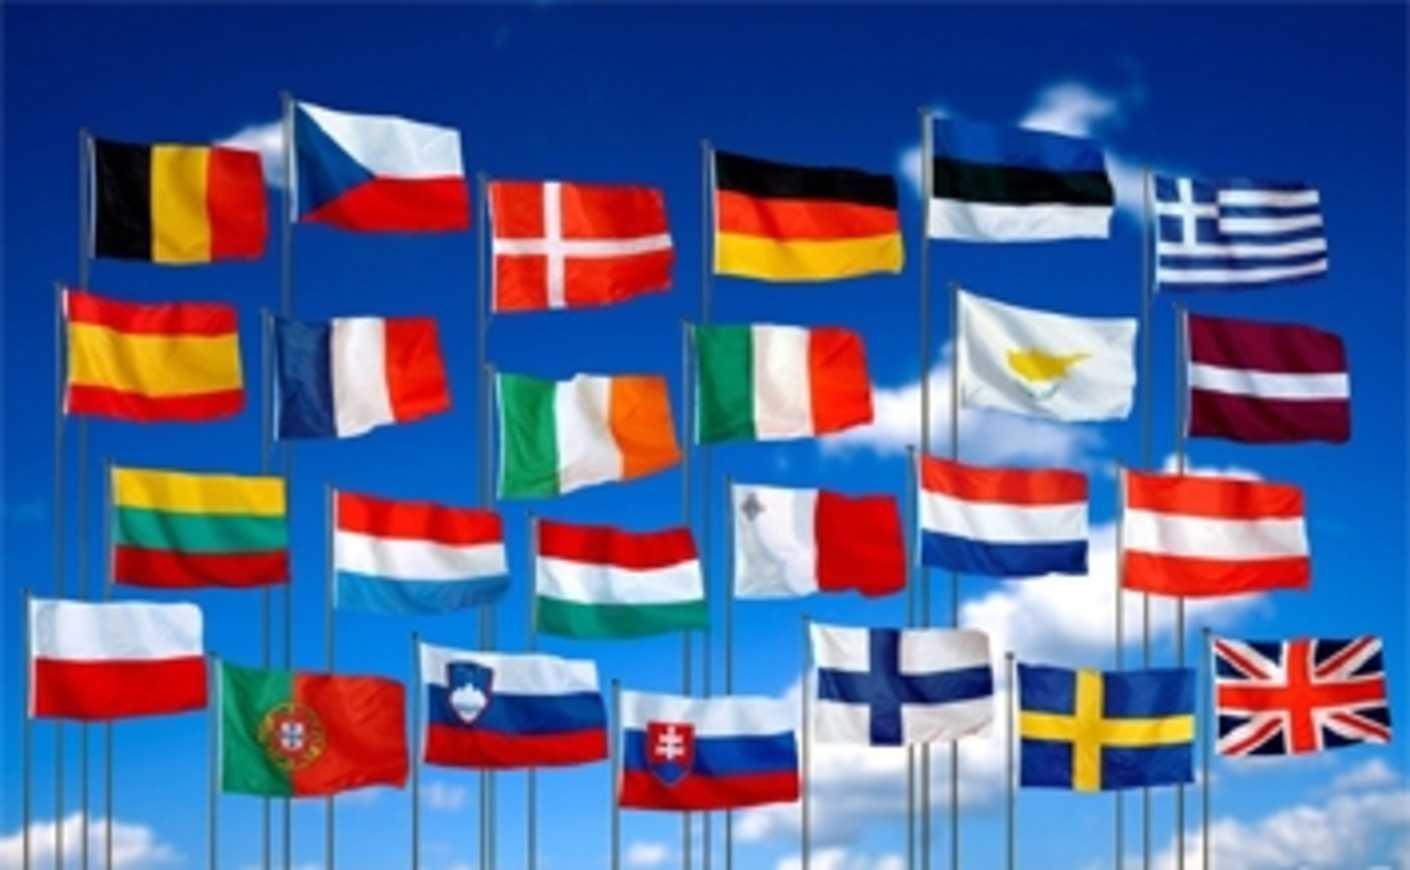 candidature en section européenne 0